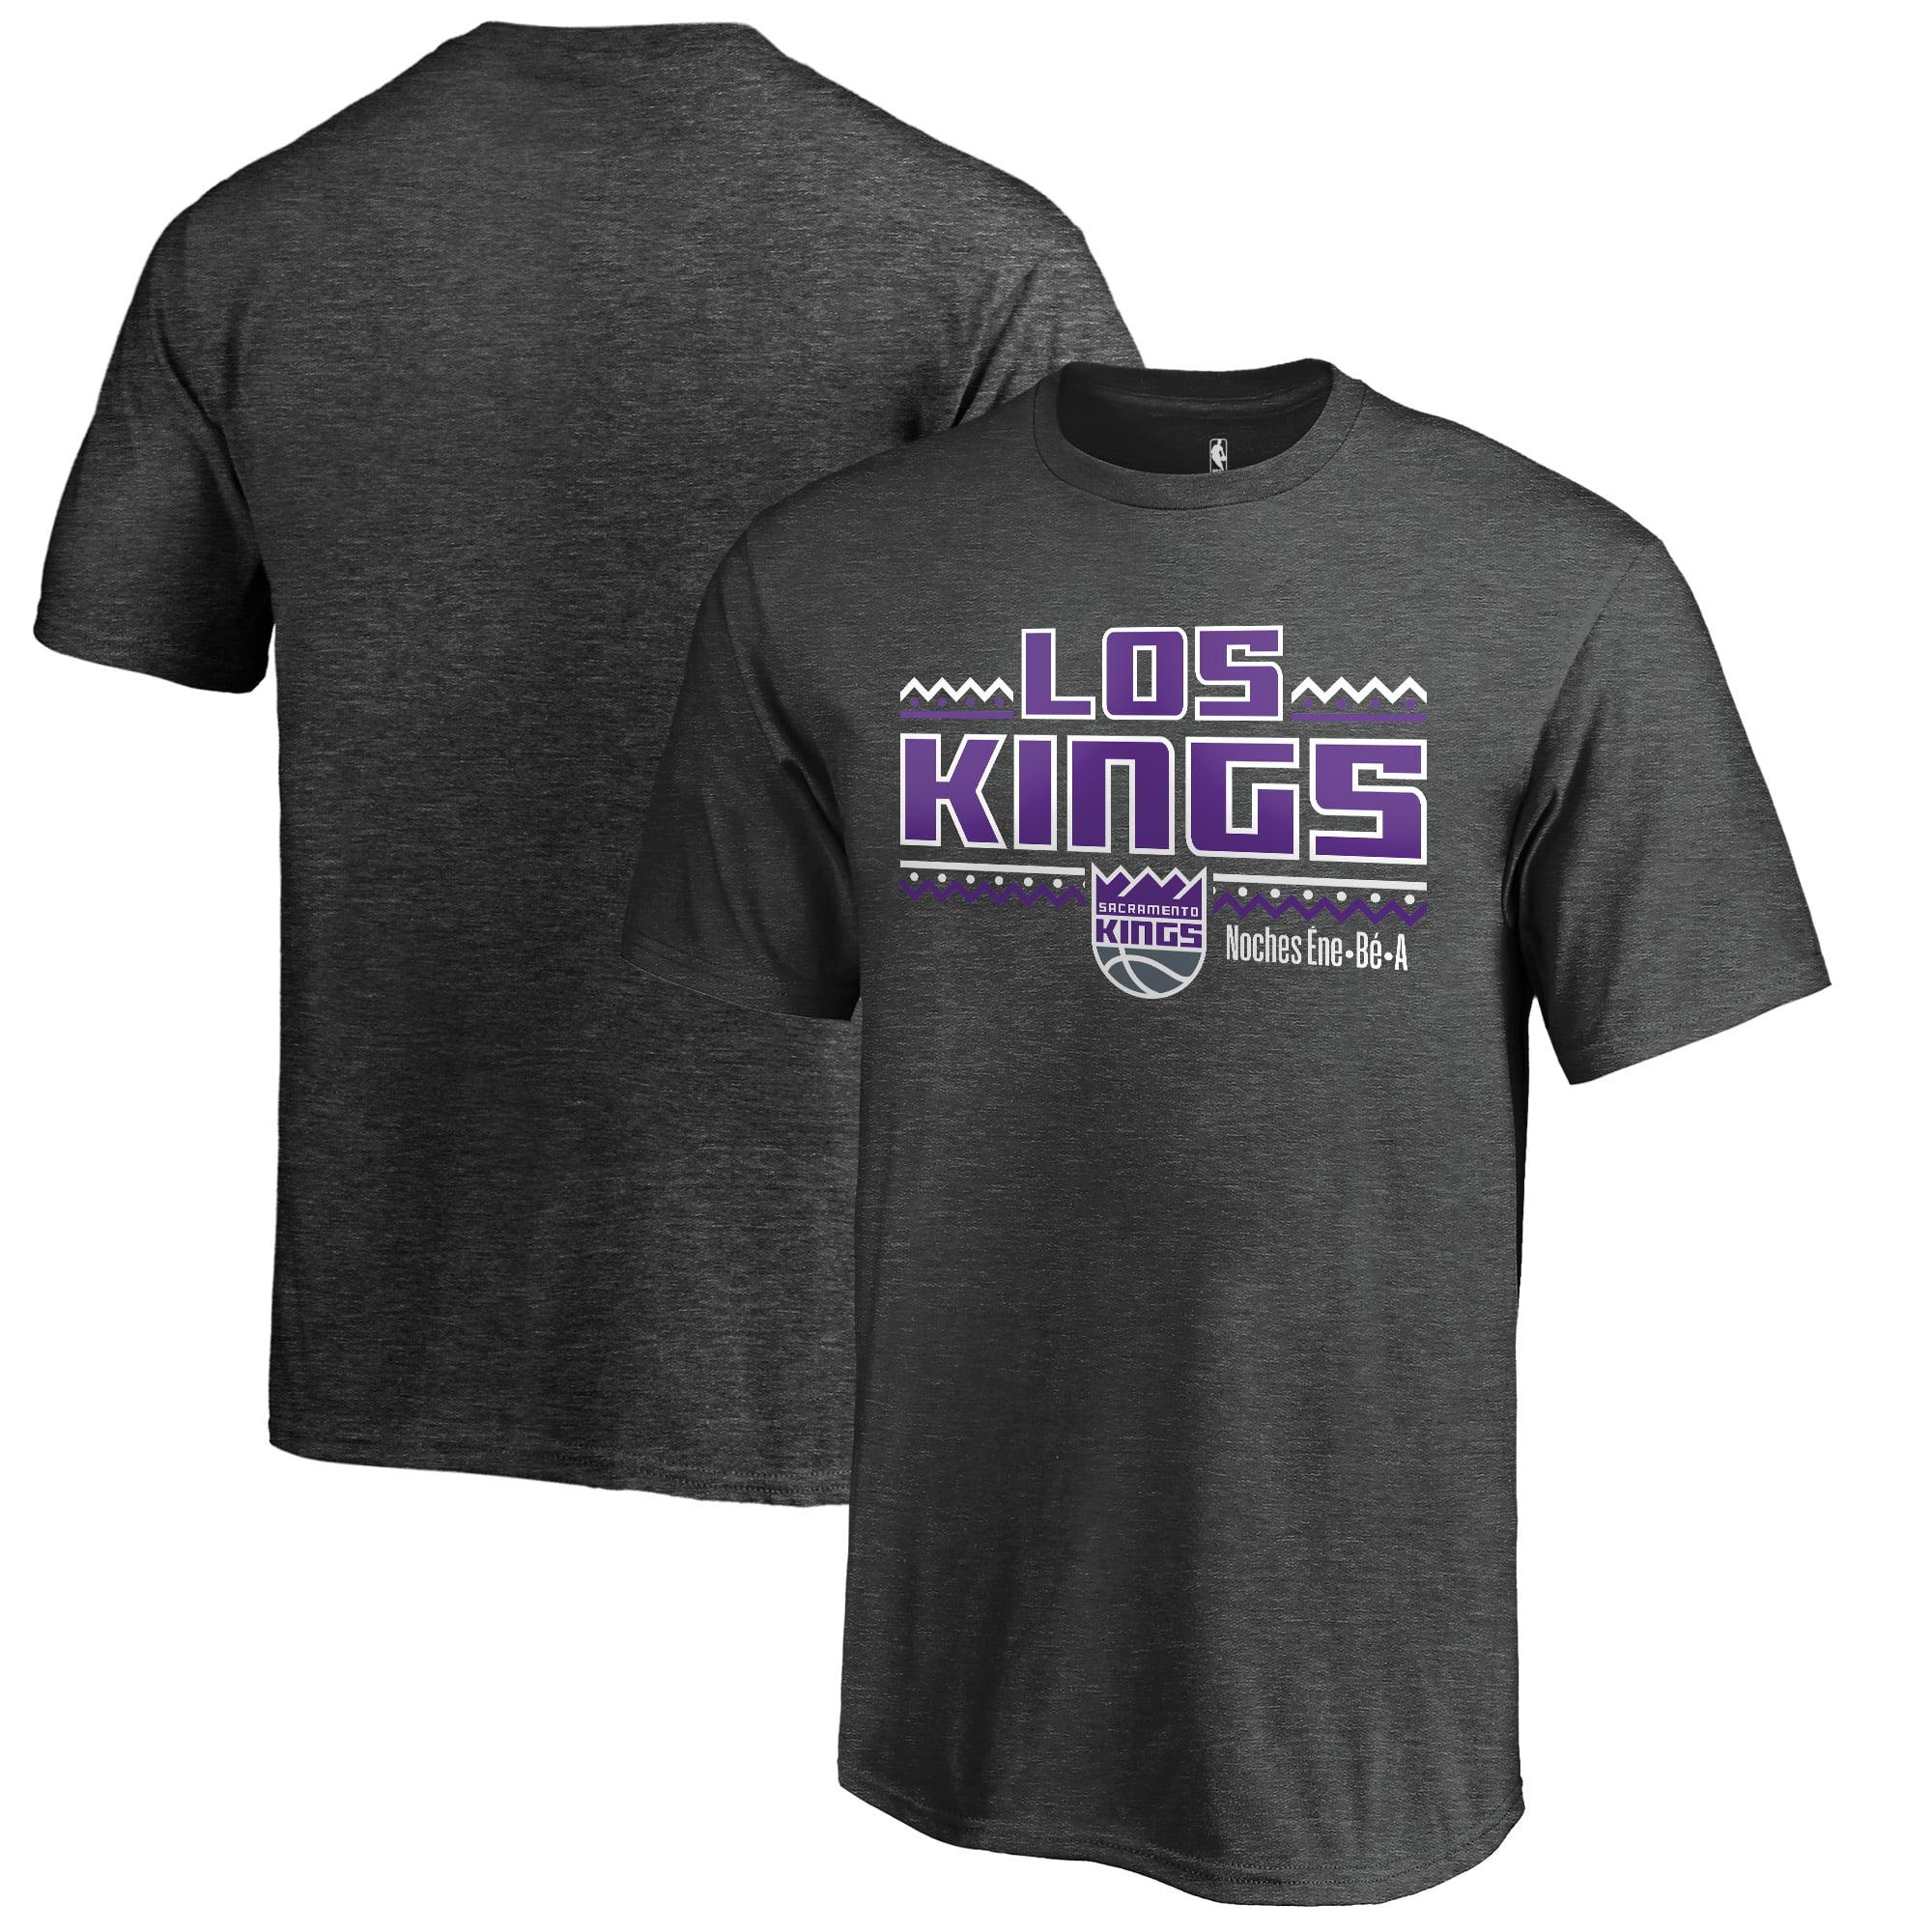 Sacramento Kings Fanatics Branded Youth Noches Ene-Be-A T-Shirt - Heather Gray